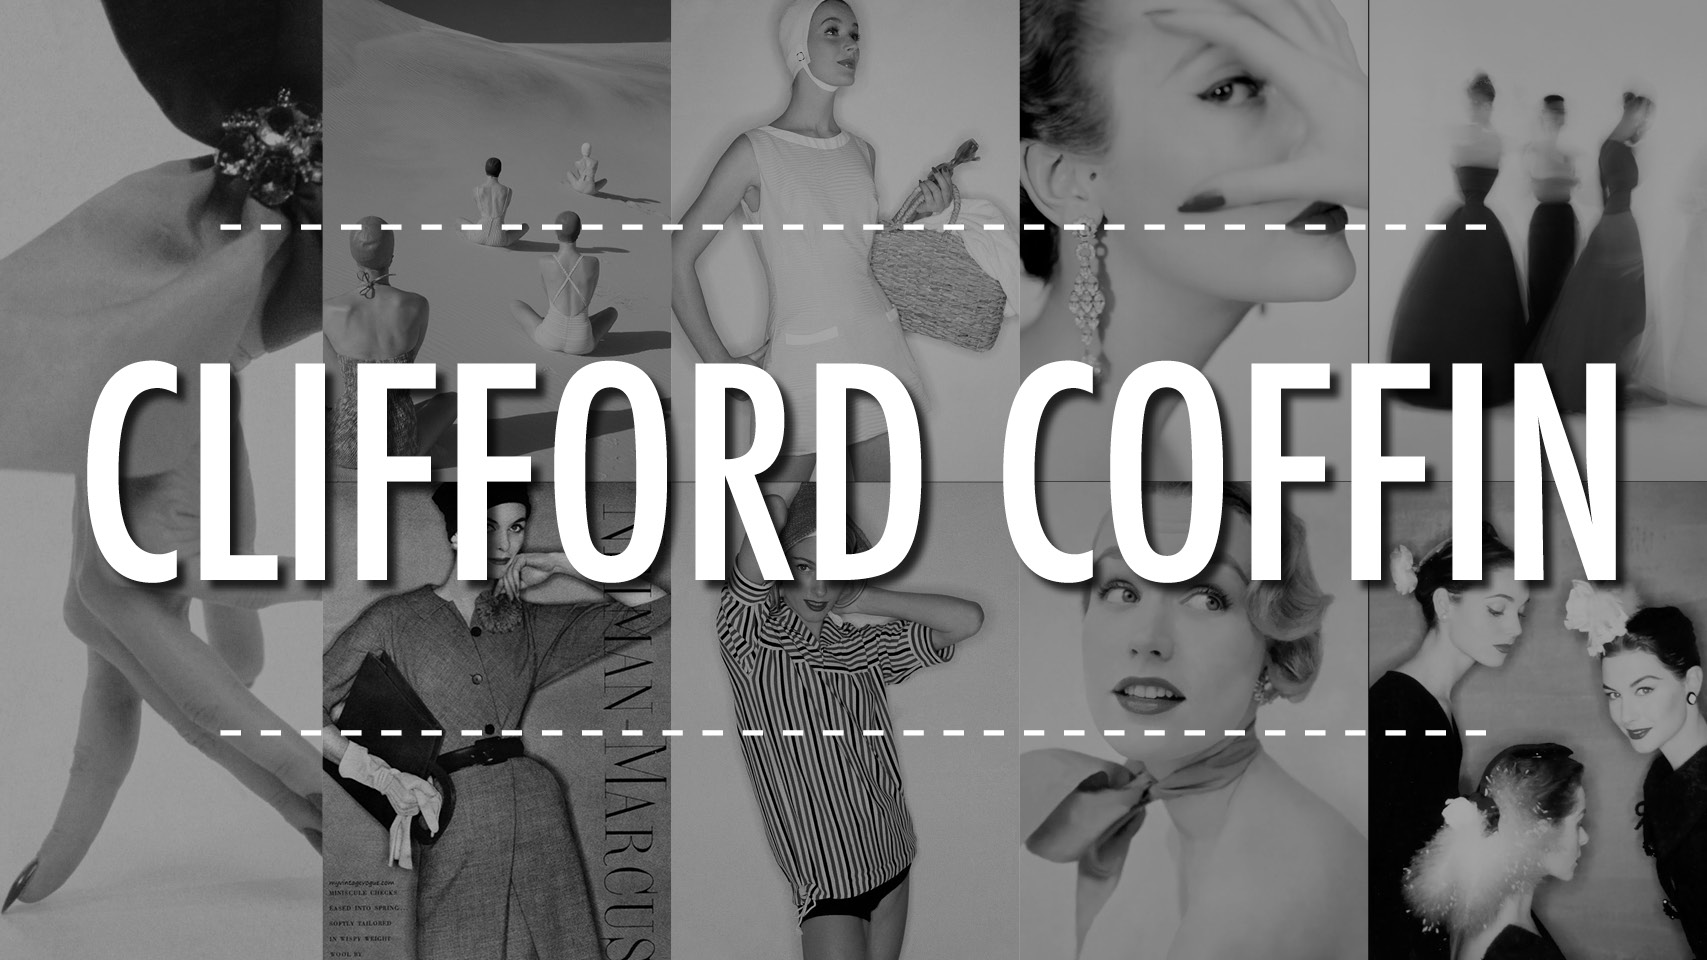 Fashion Photographers - Clifford Coffin - Thumb.jpg